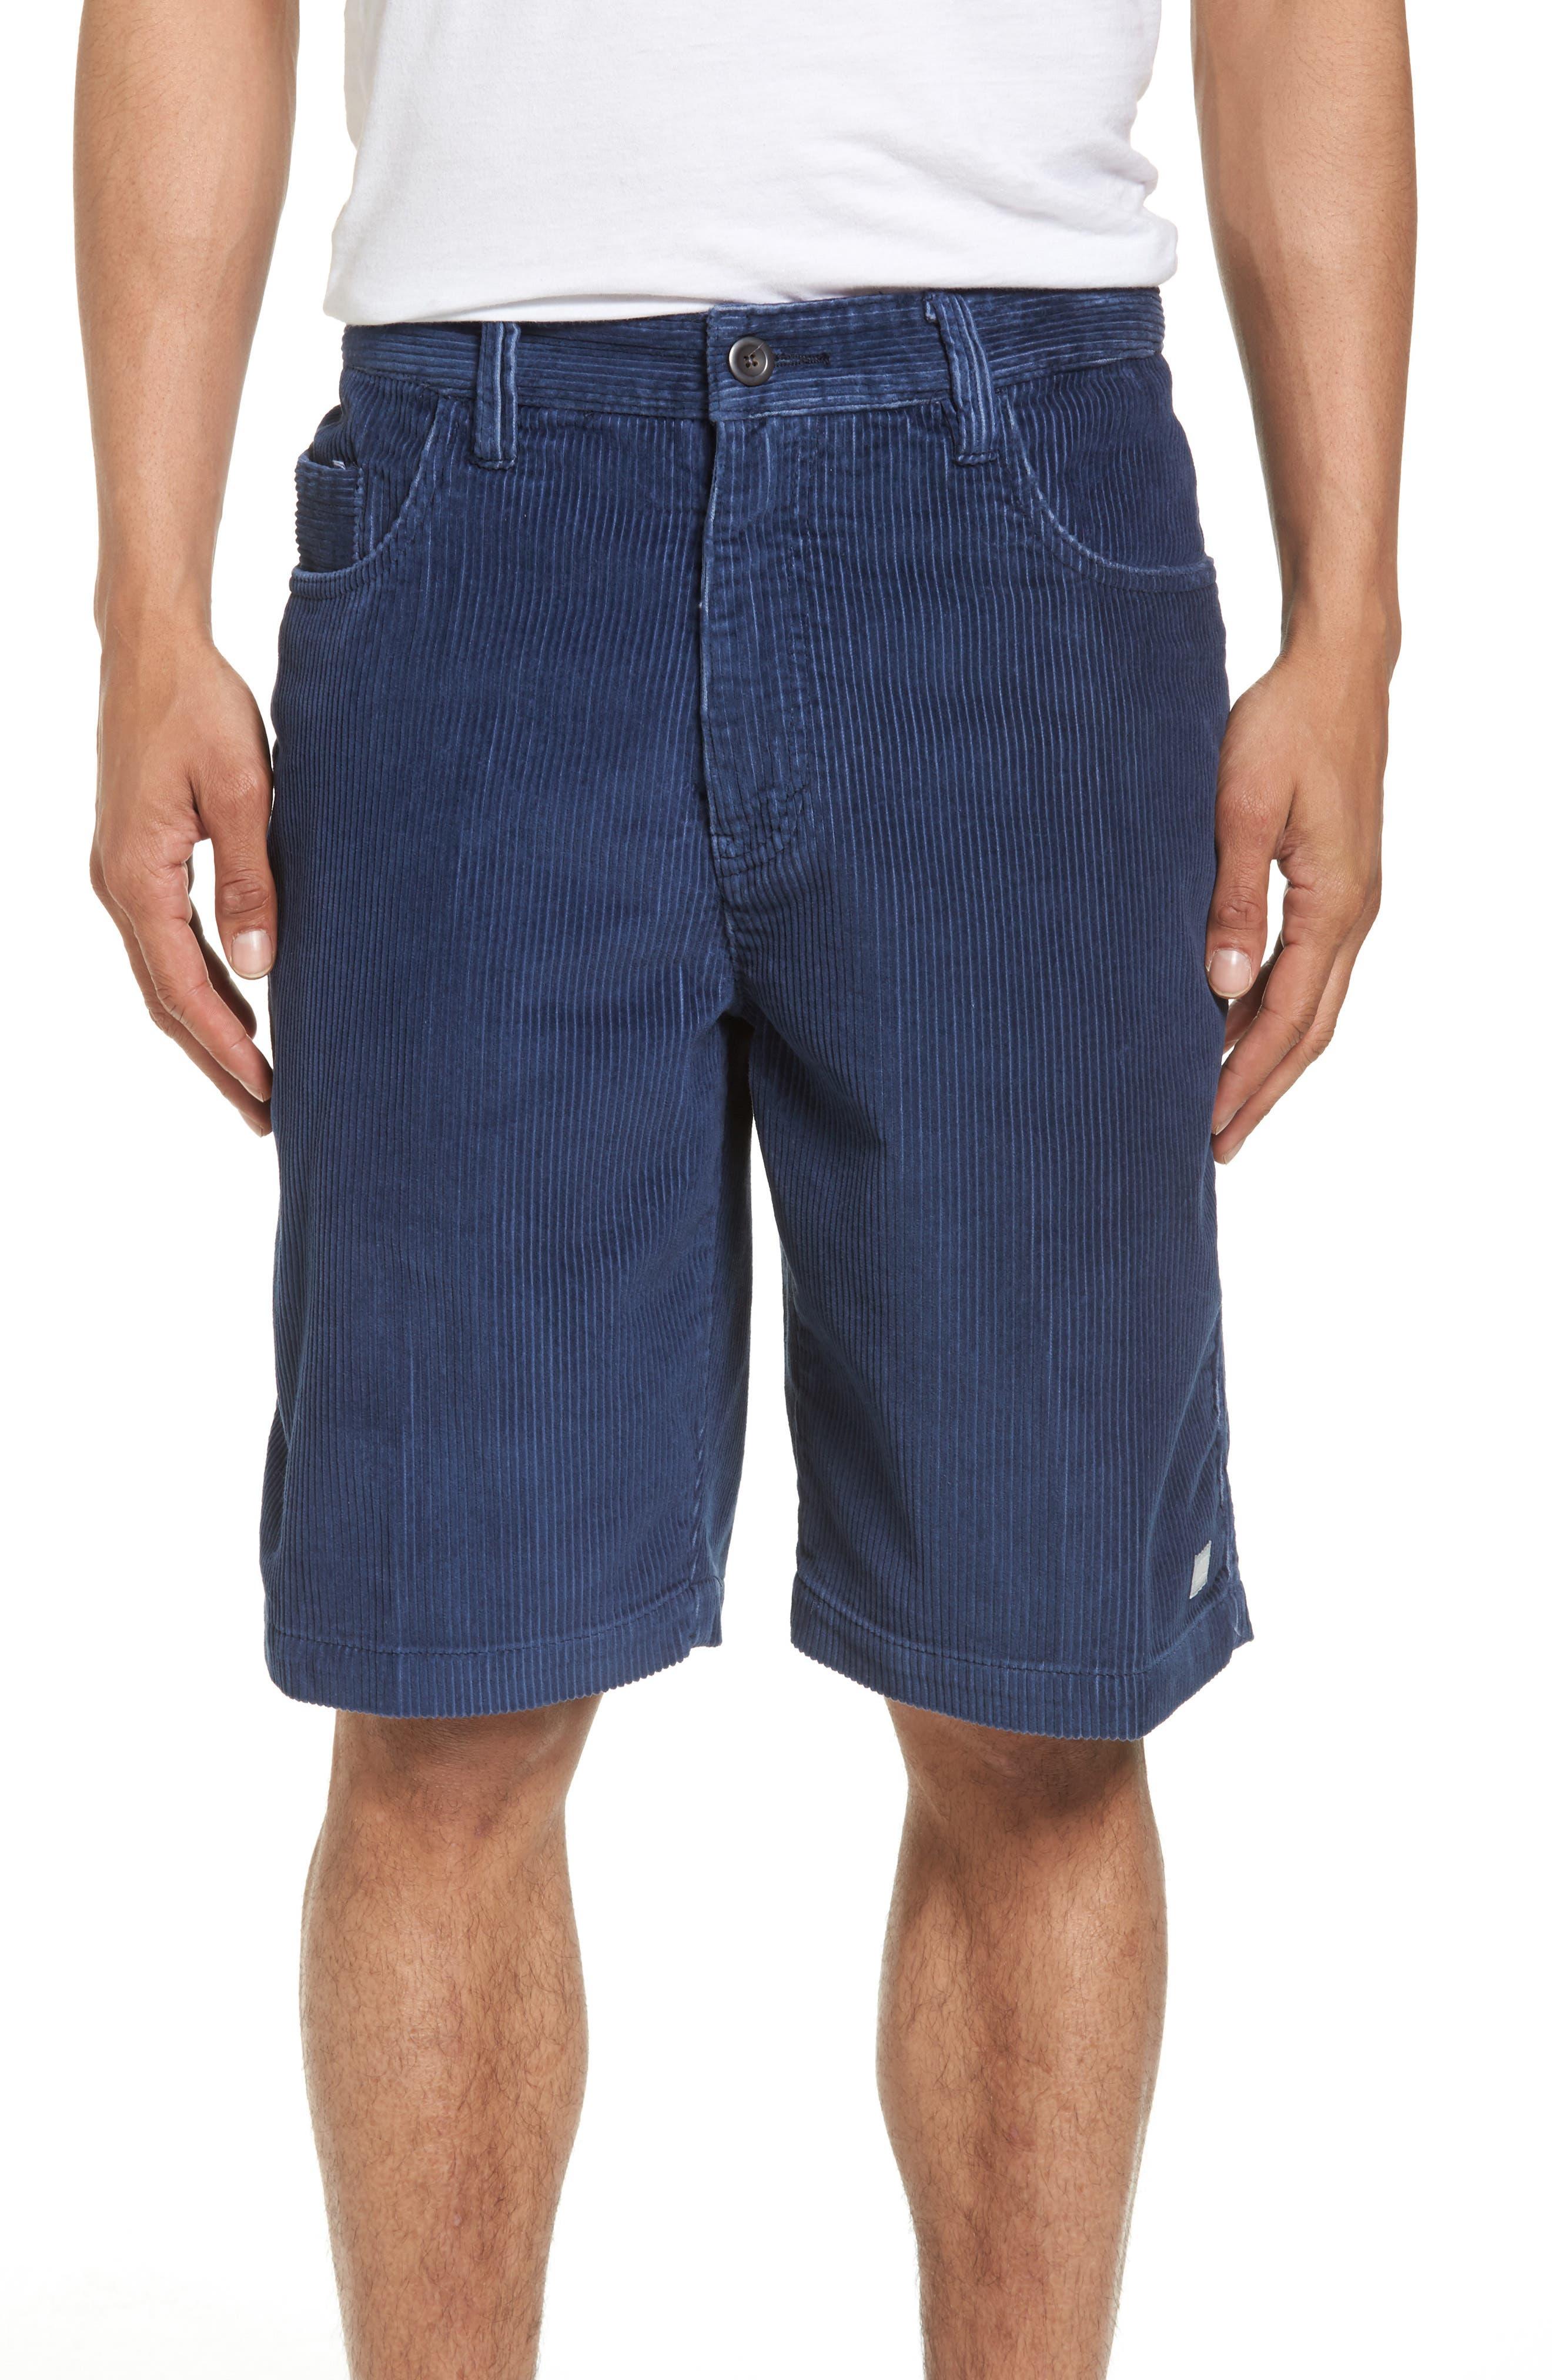 Kordo Corduroy Walking Shorts,                         Main,                         color, 410